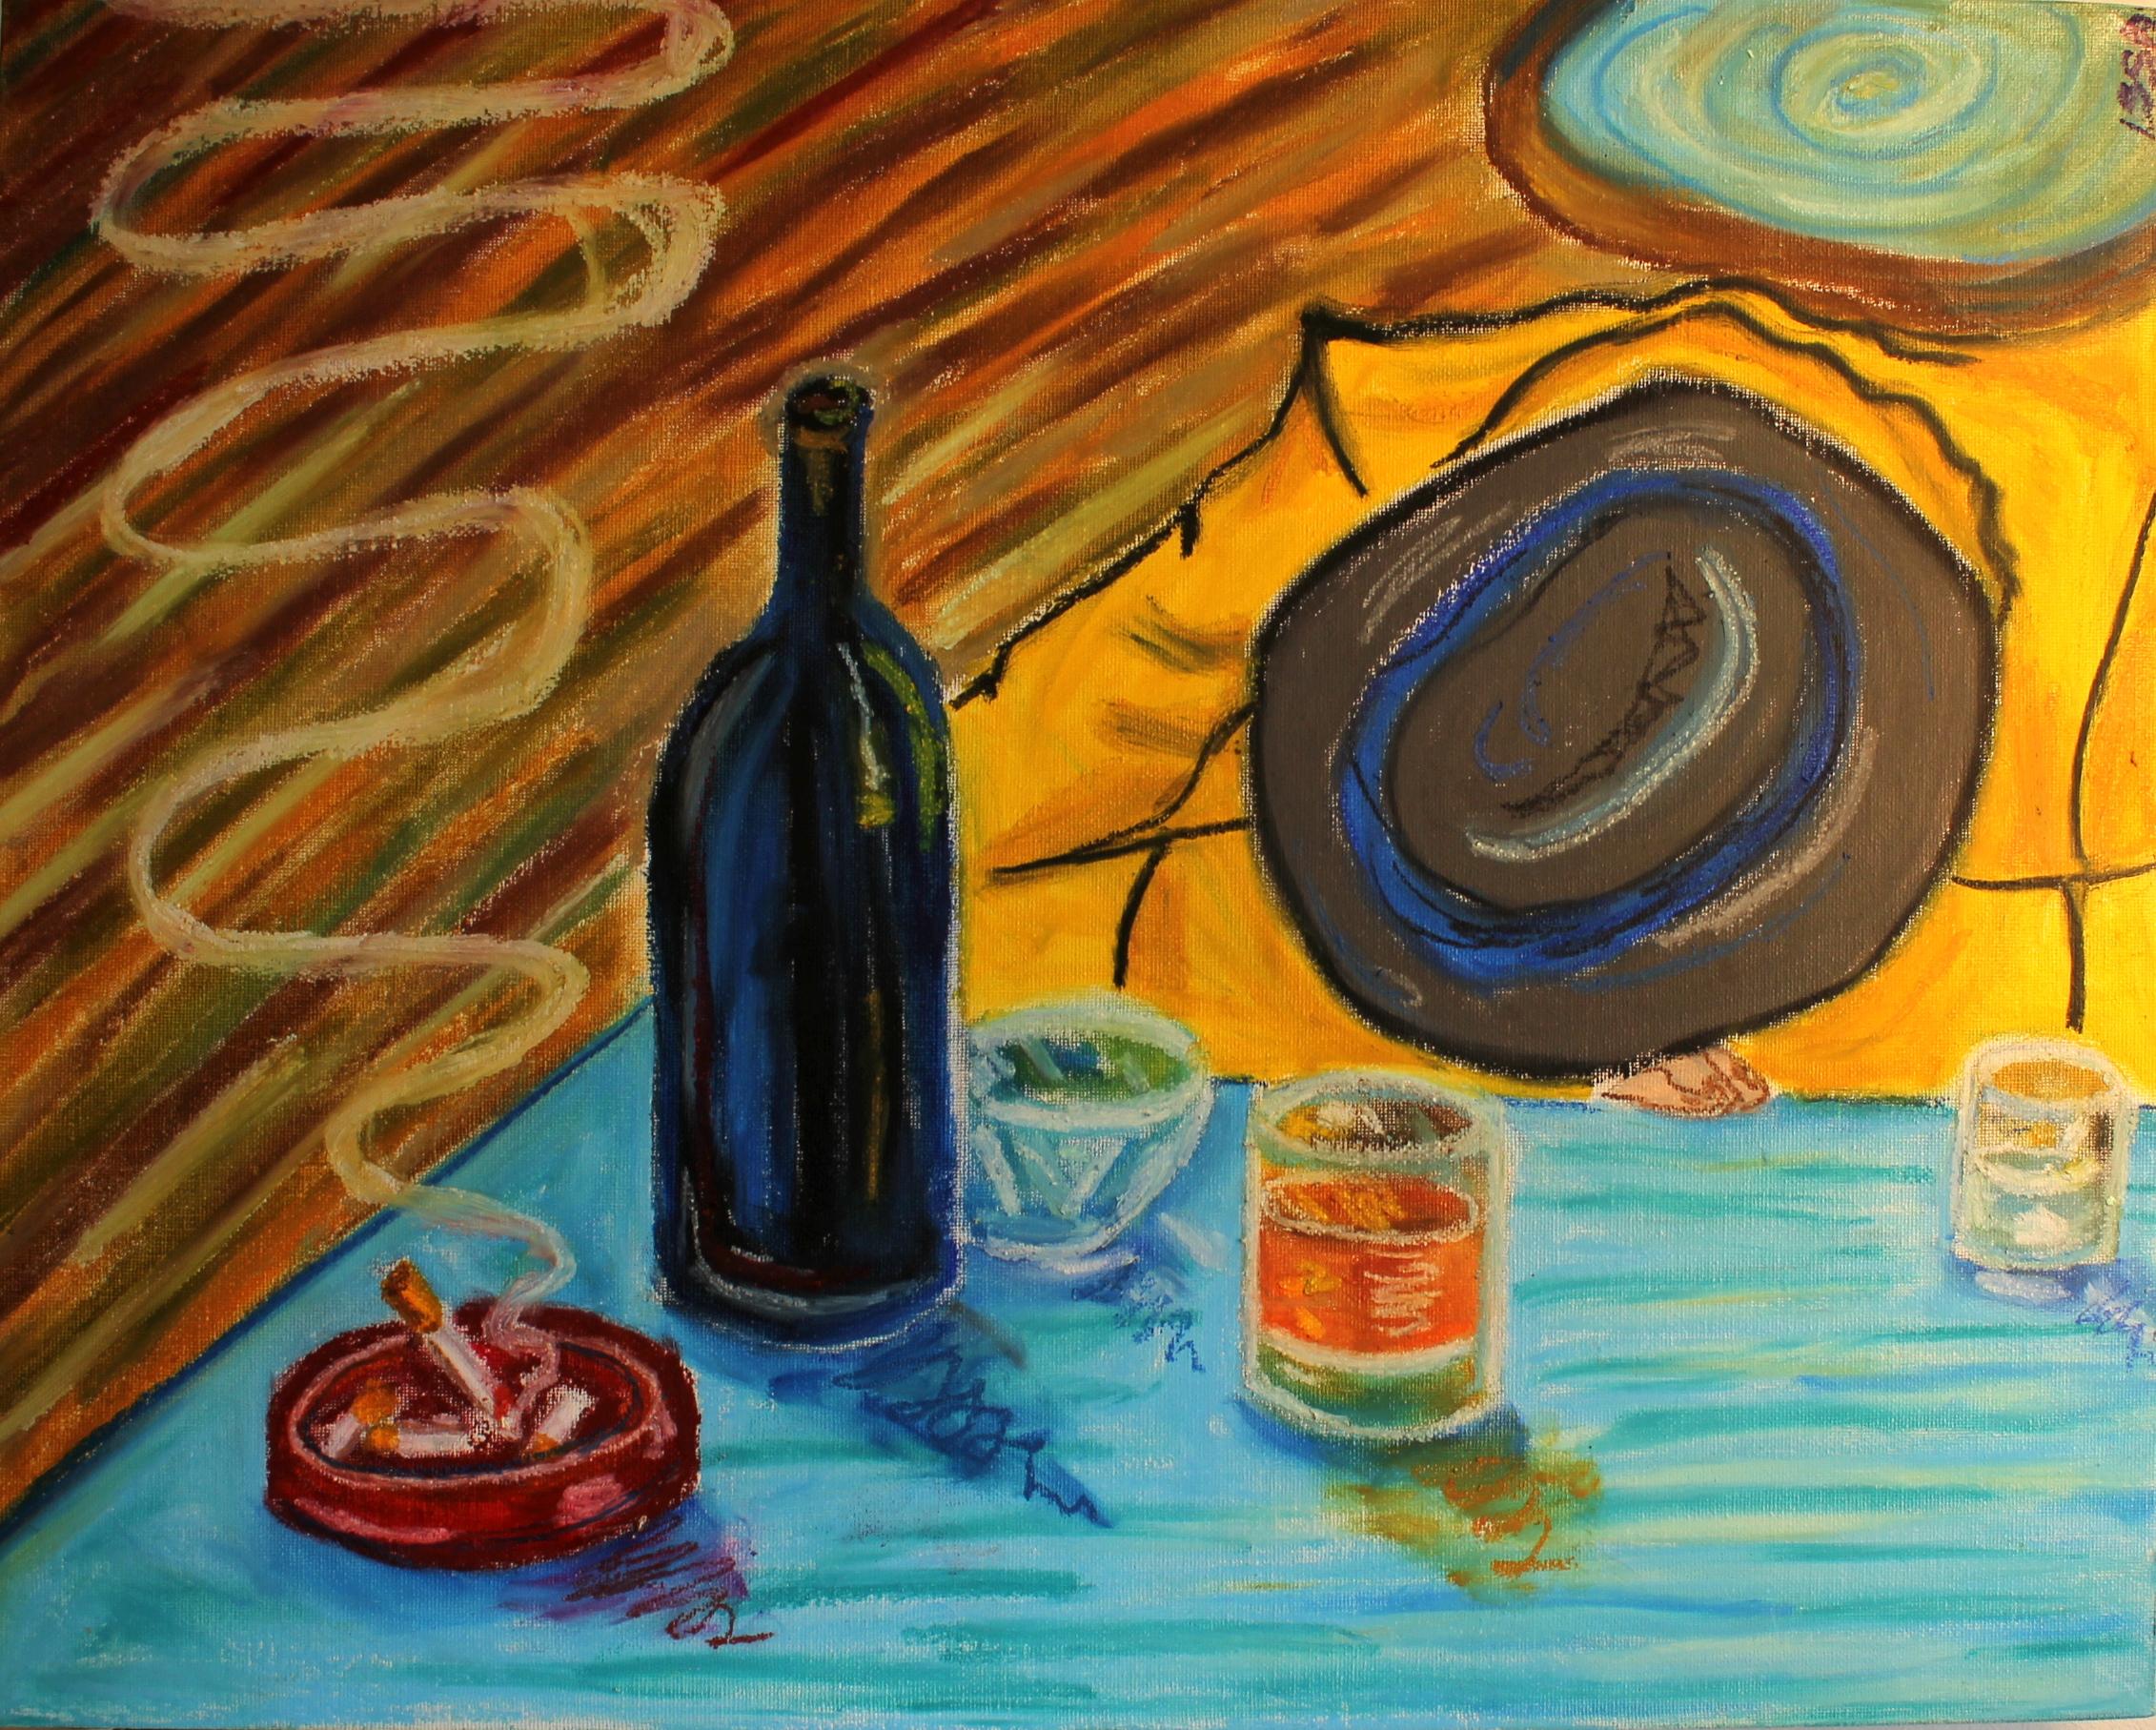 Still Life with Wine Bottle, Cigarette and drunk gentleman